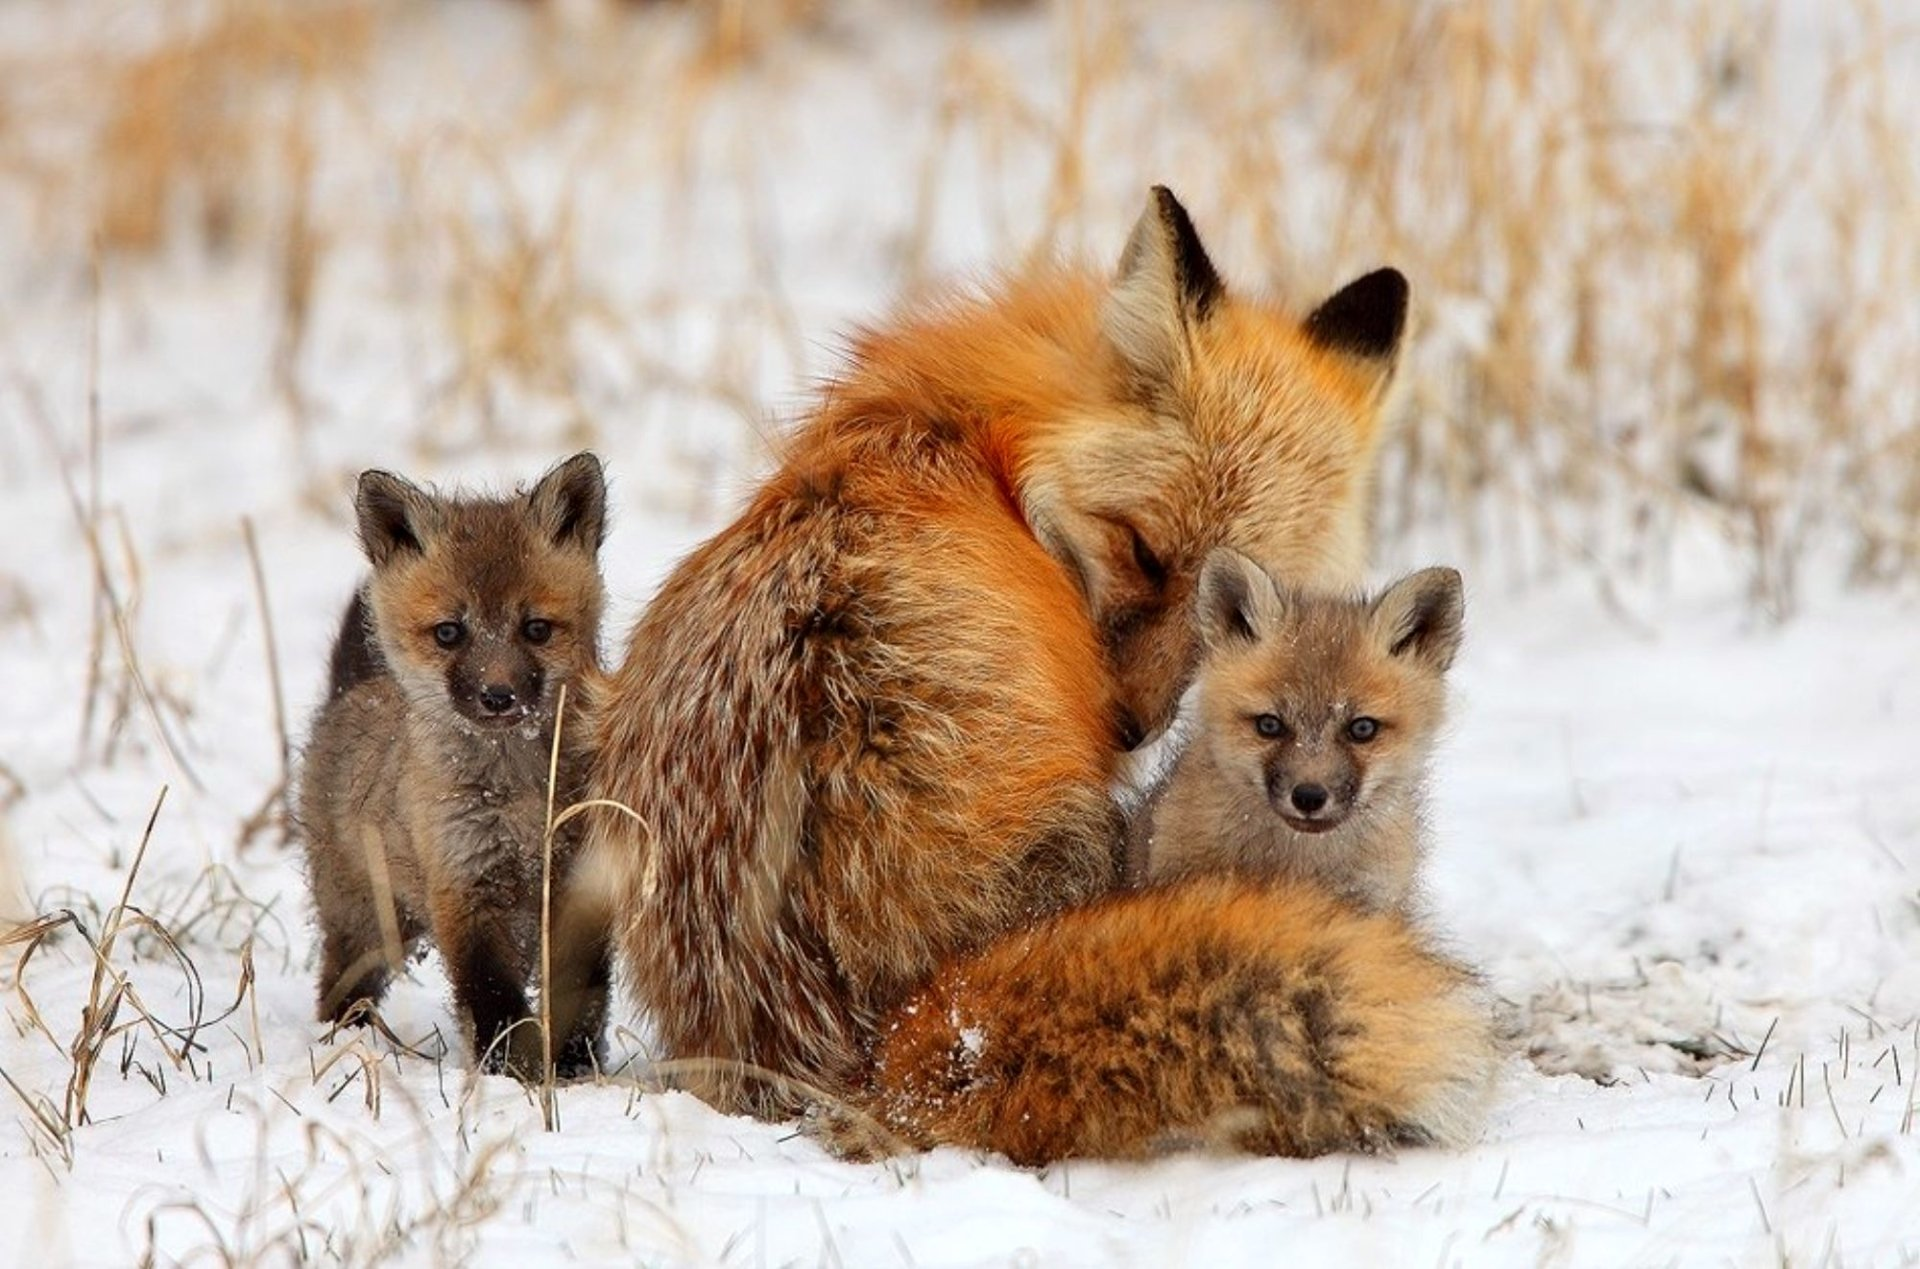 Animal - Fox  Animal Wildlife Cub Wallpaper